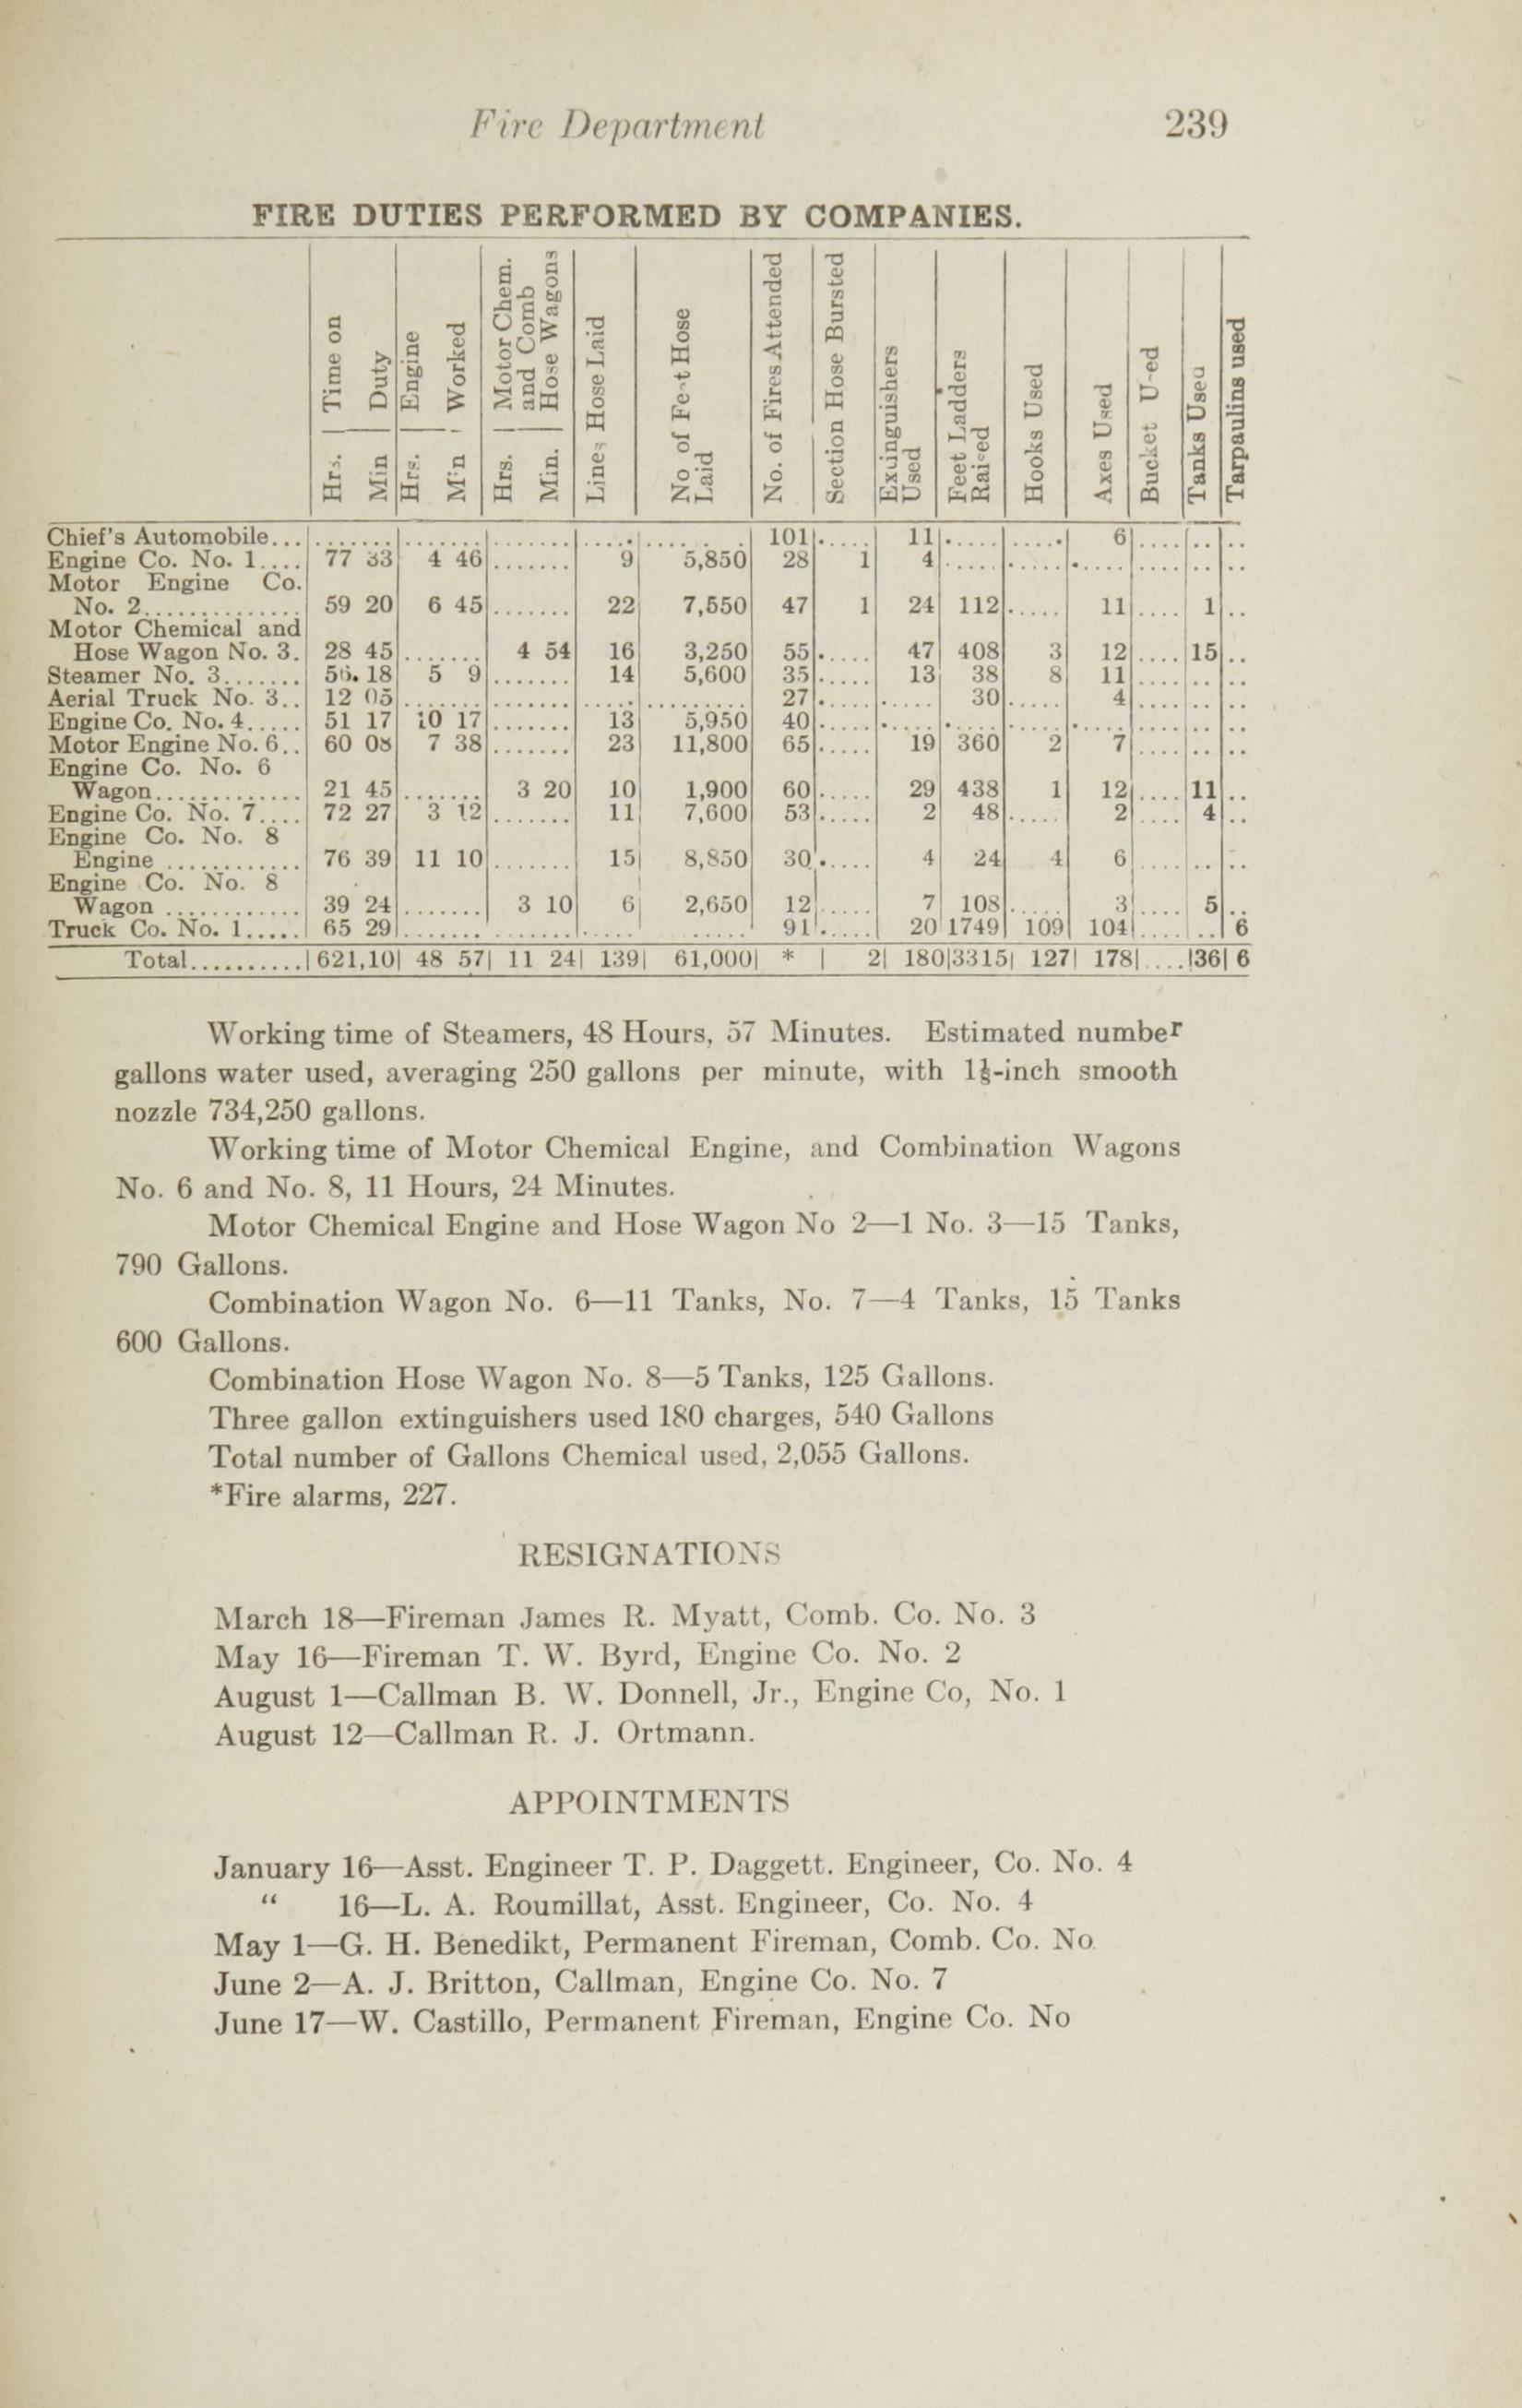 Charleston Yearbook, 1915, page 239